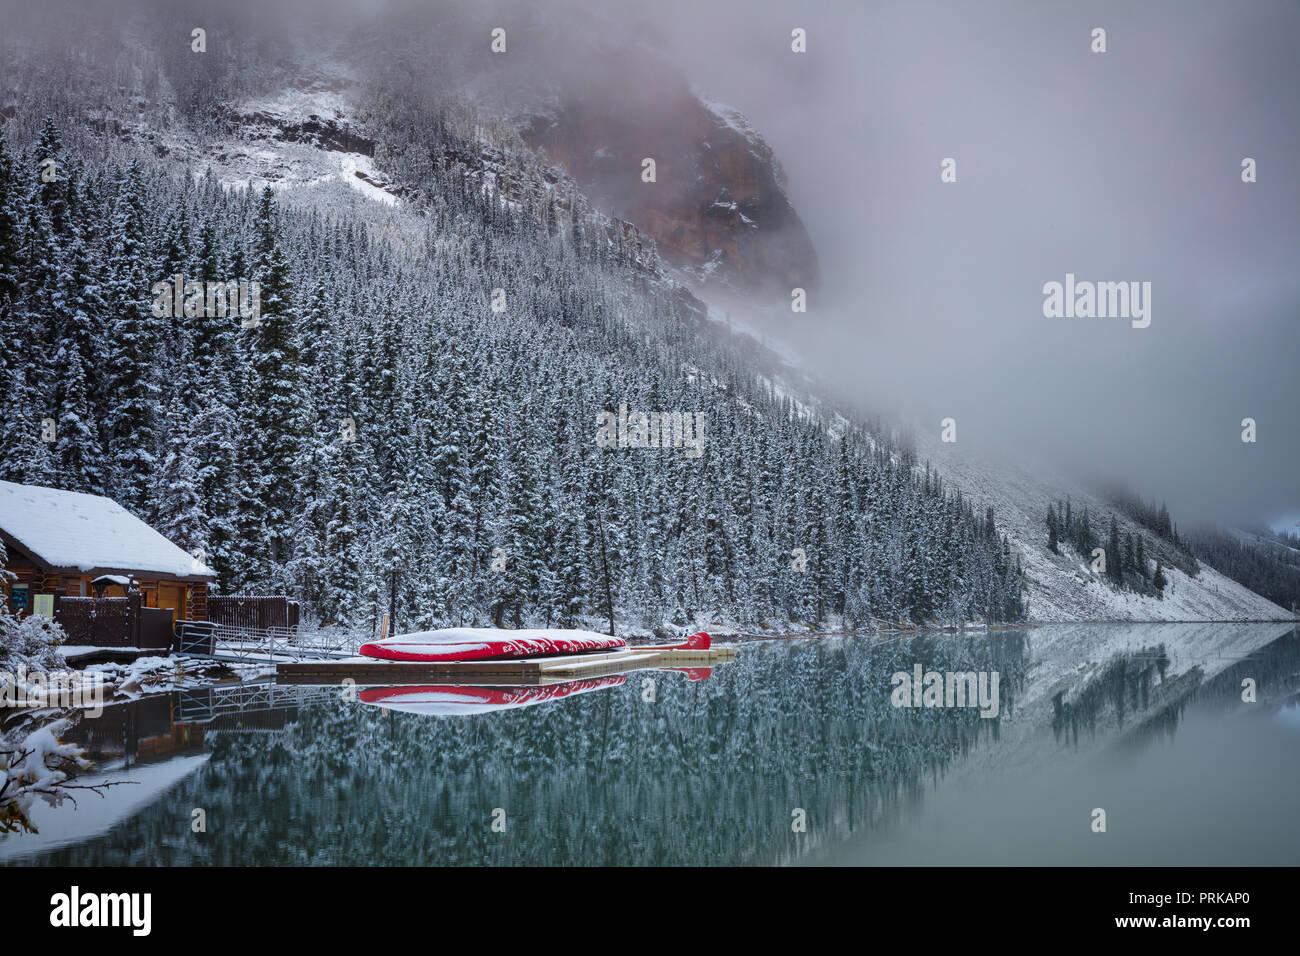 Lake Louise ist ein Gletschersee im Banff National Park in Alberta, Kanada. Stockbild